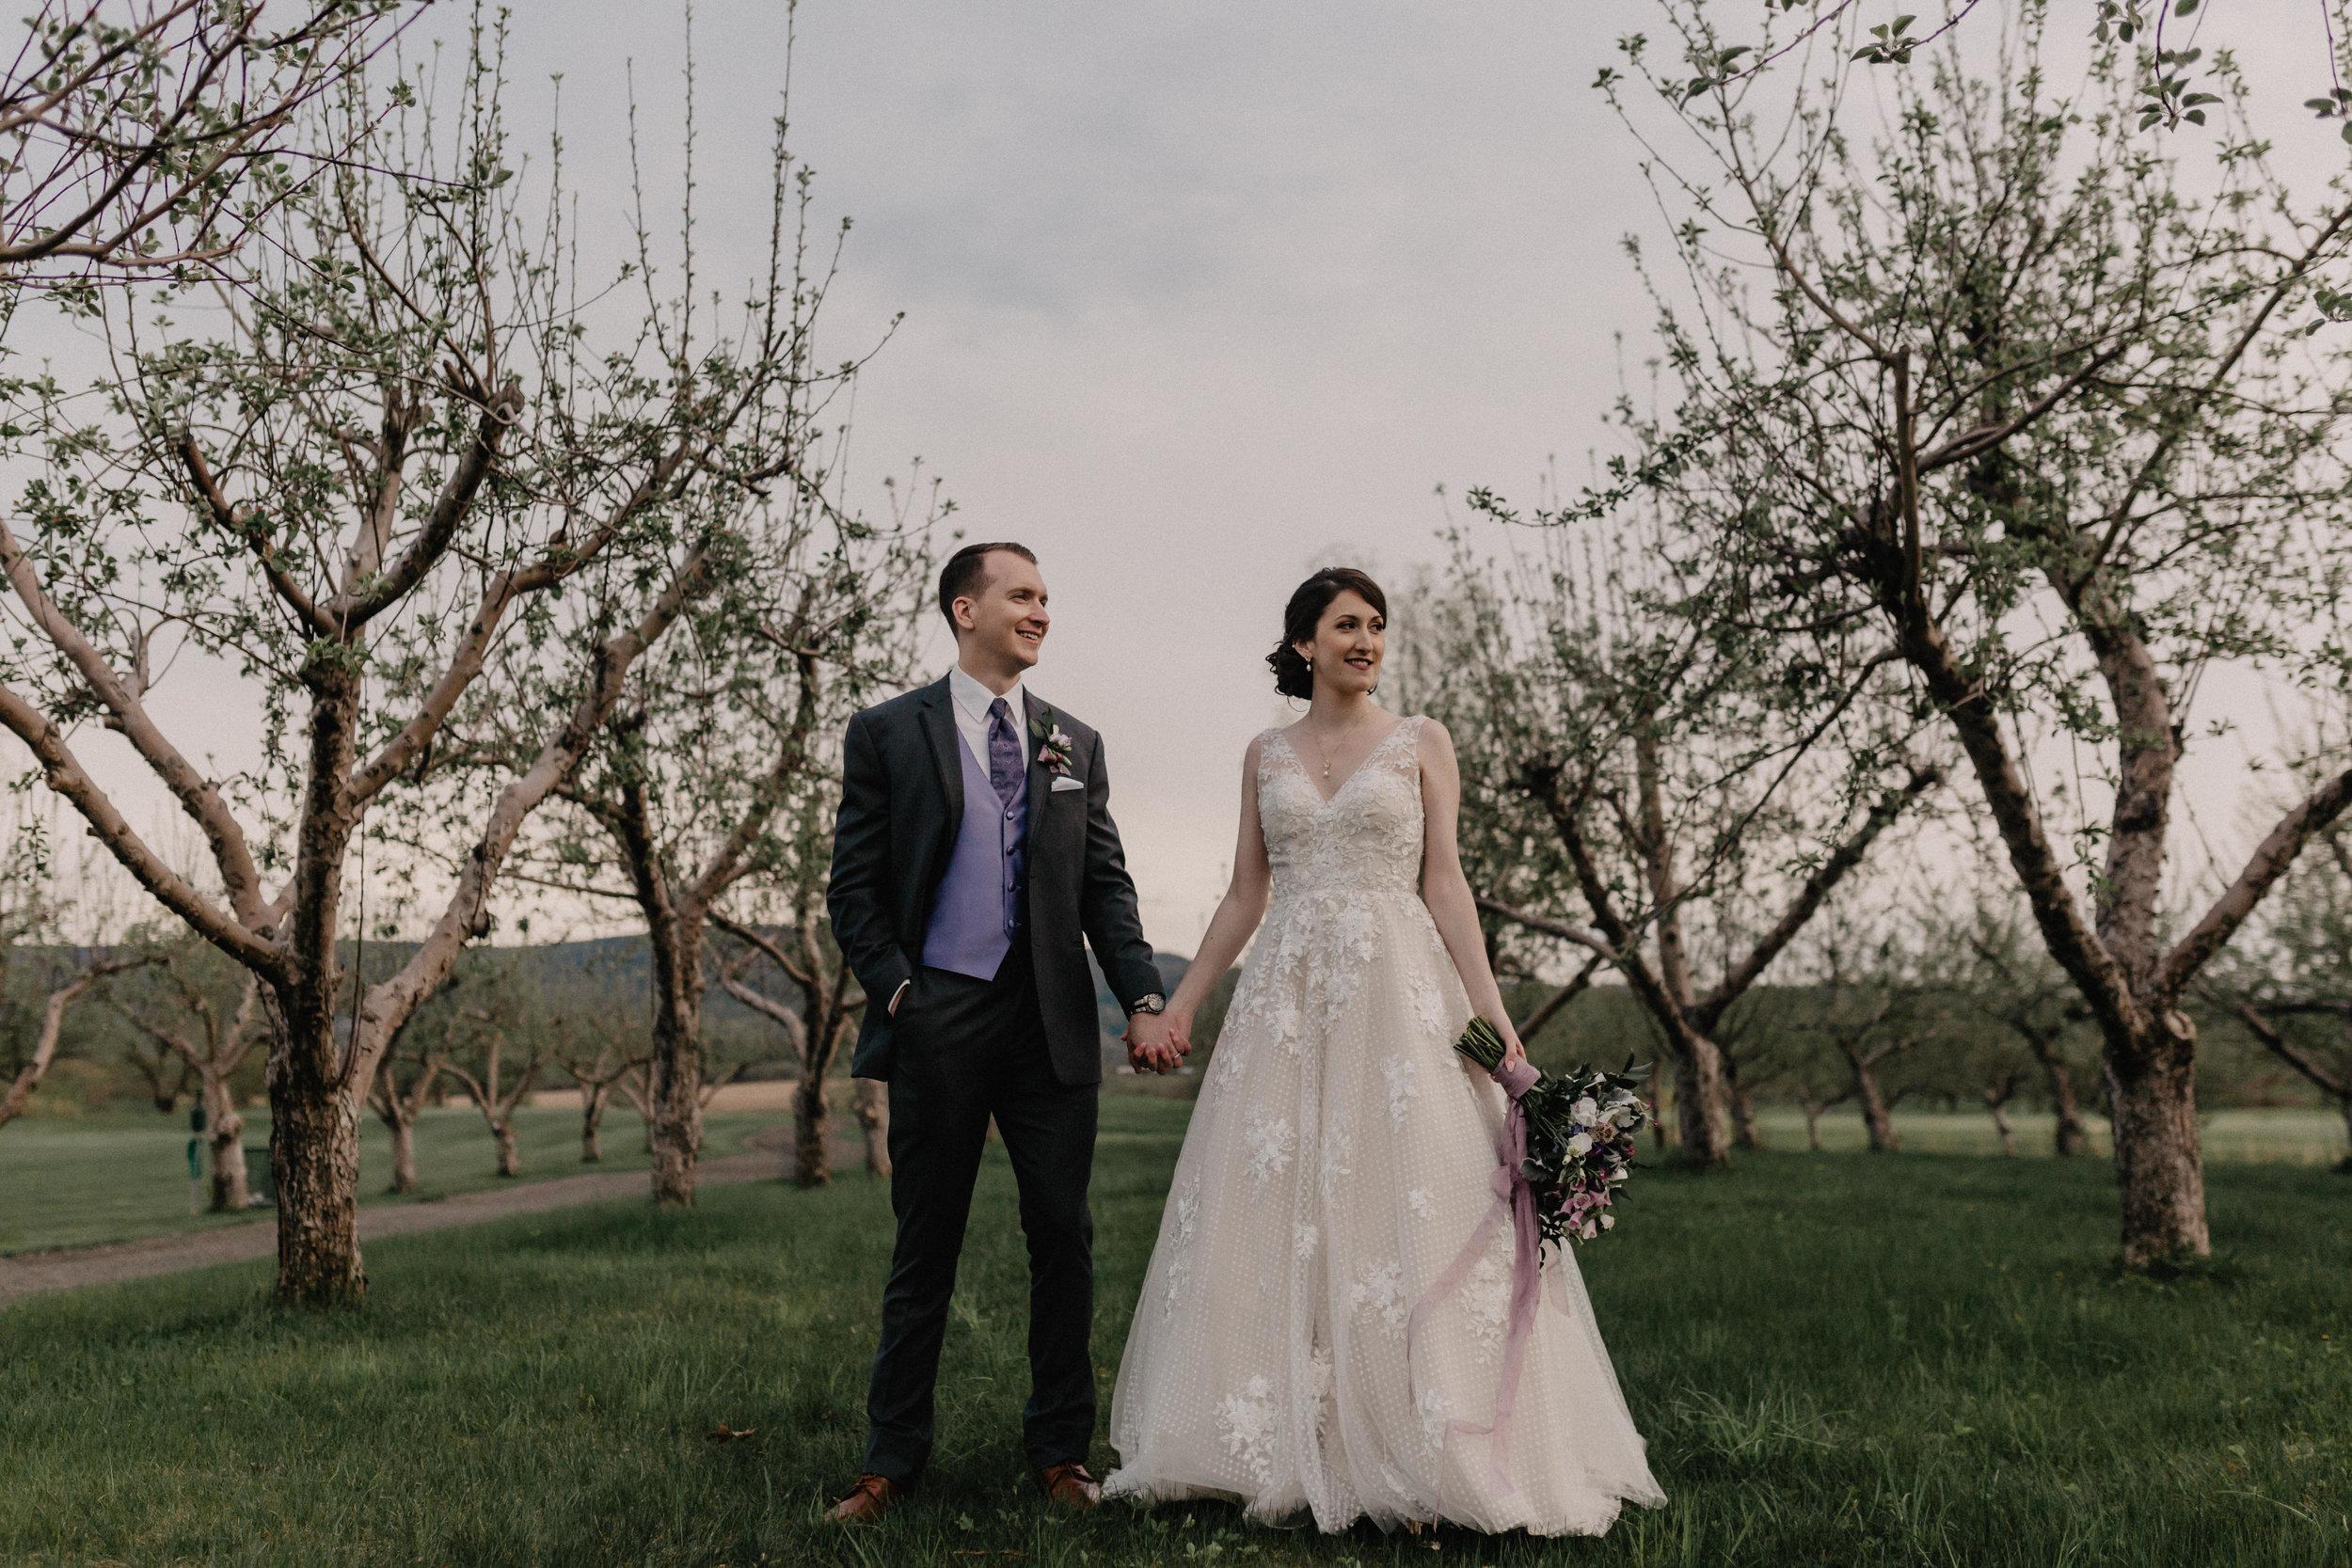 orchard-creek-wedding_065.jpg